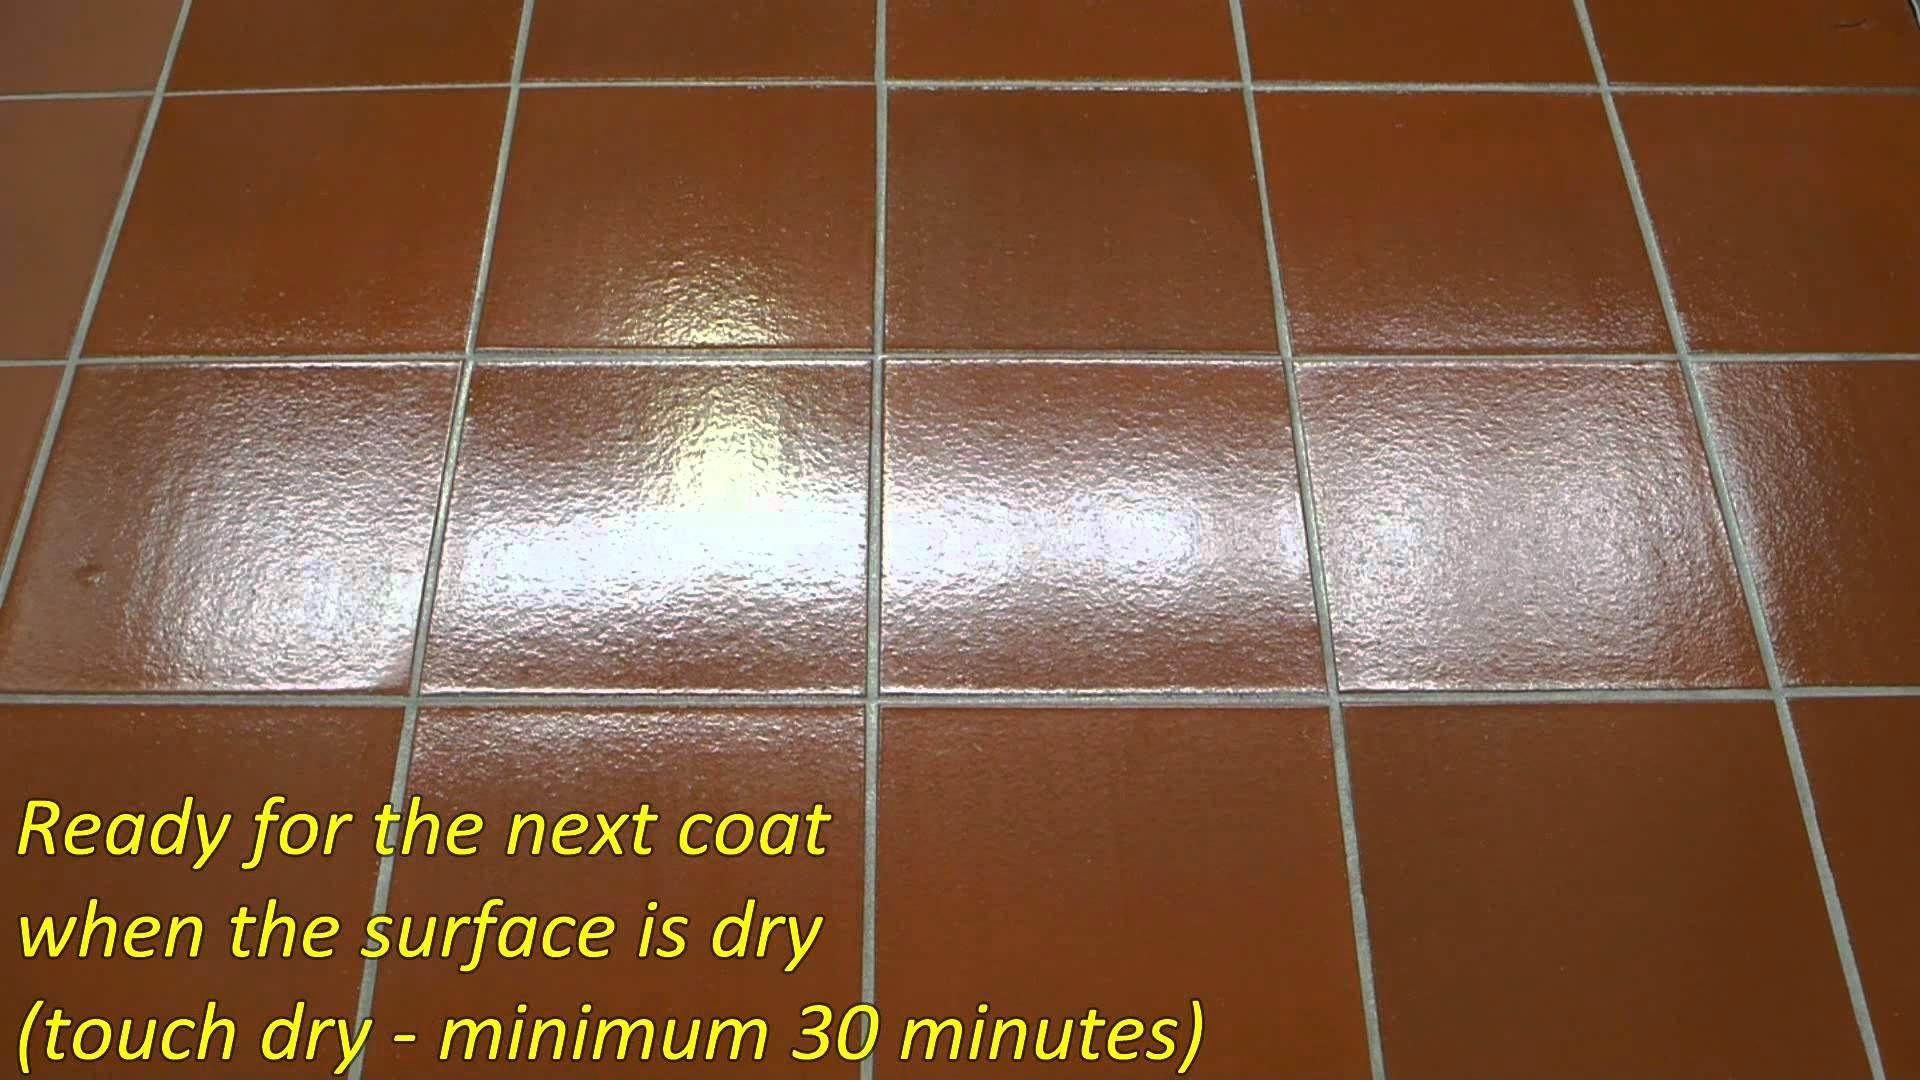 How To Apply A High Gloss Finish Aquashine Fp Aqua Seal Stc Ceramic Tiles Ceramic Floor Tile Cleaning Ceramic Tiles